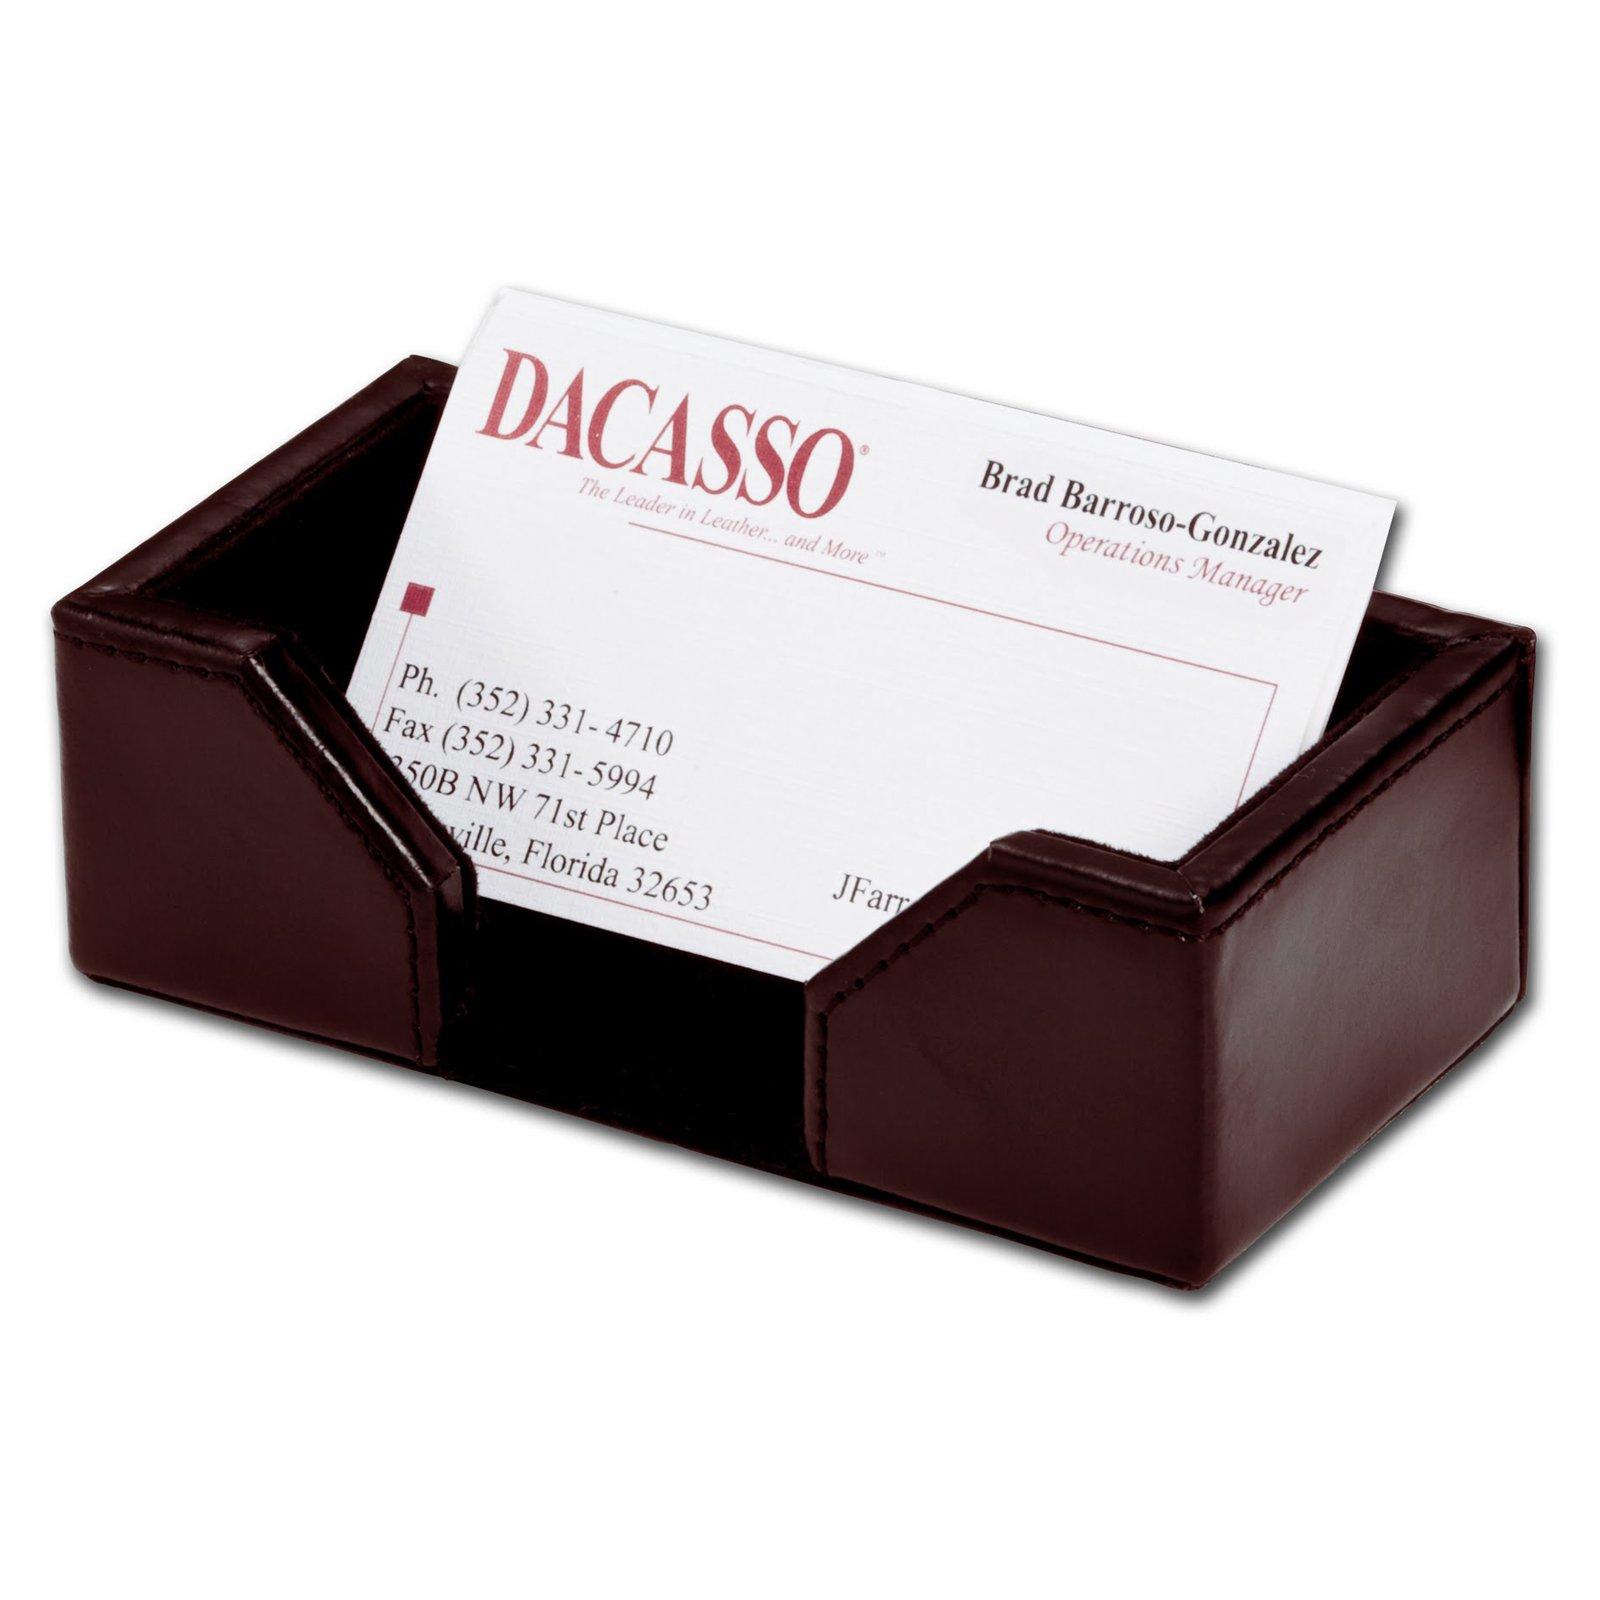 Dacasso Bonded Leather Business Card Holder - Dark Brown